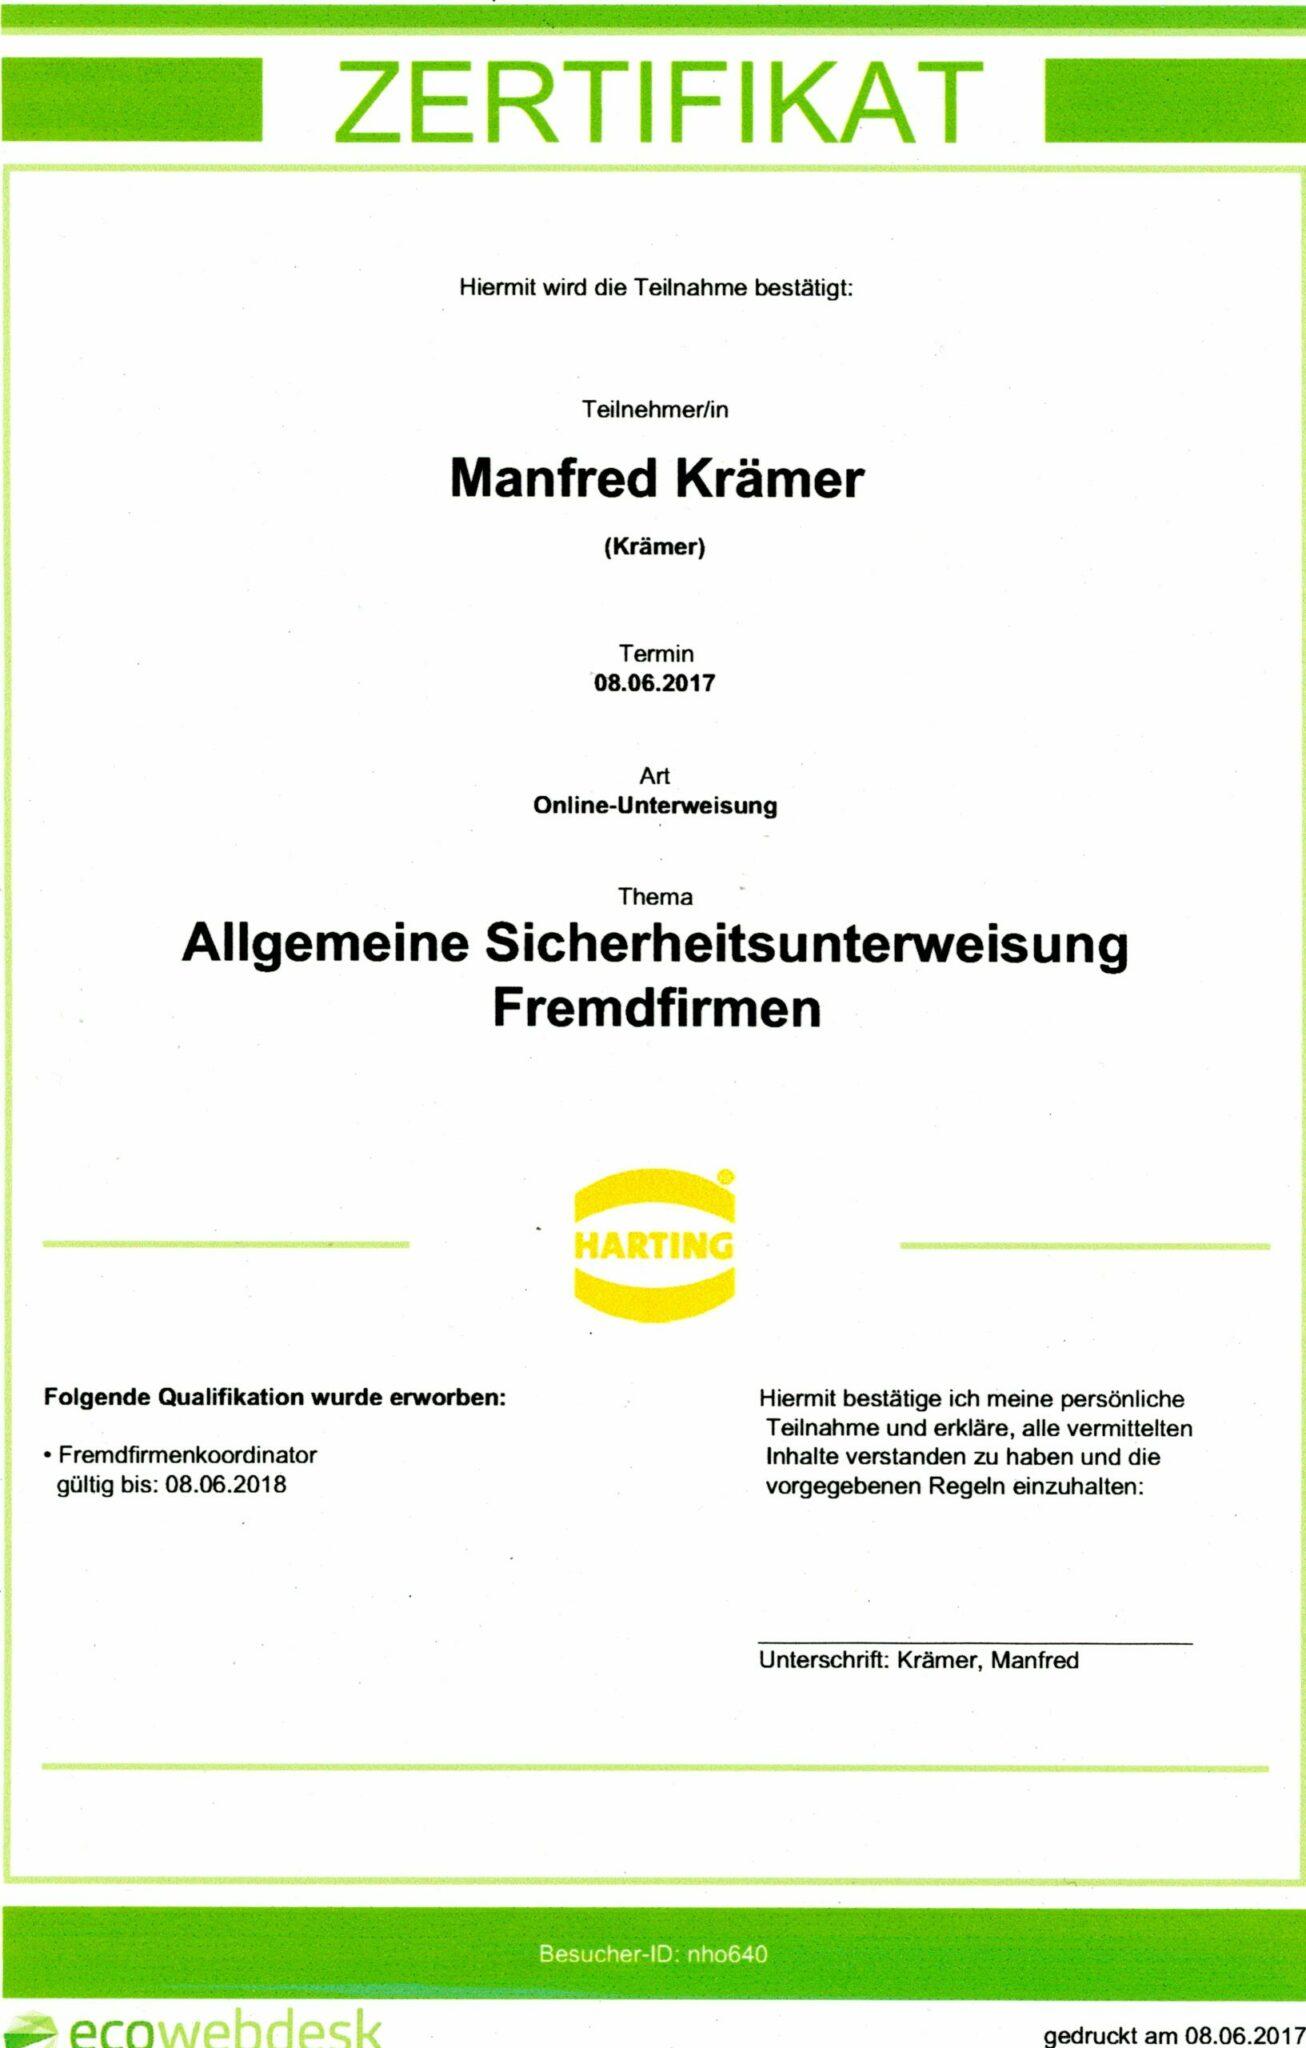 Harting Zertifikat Unterweisung